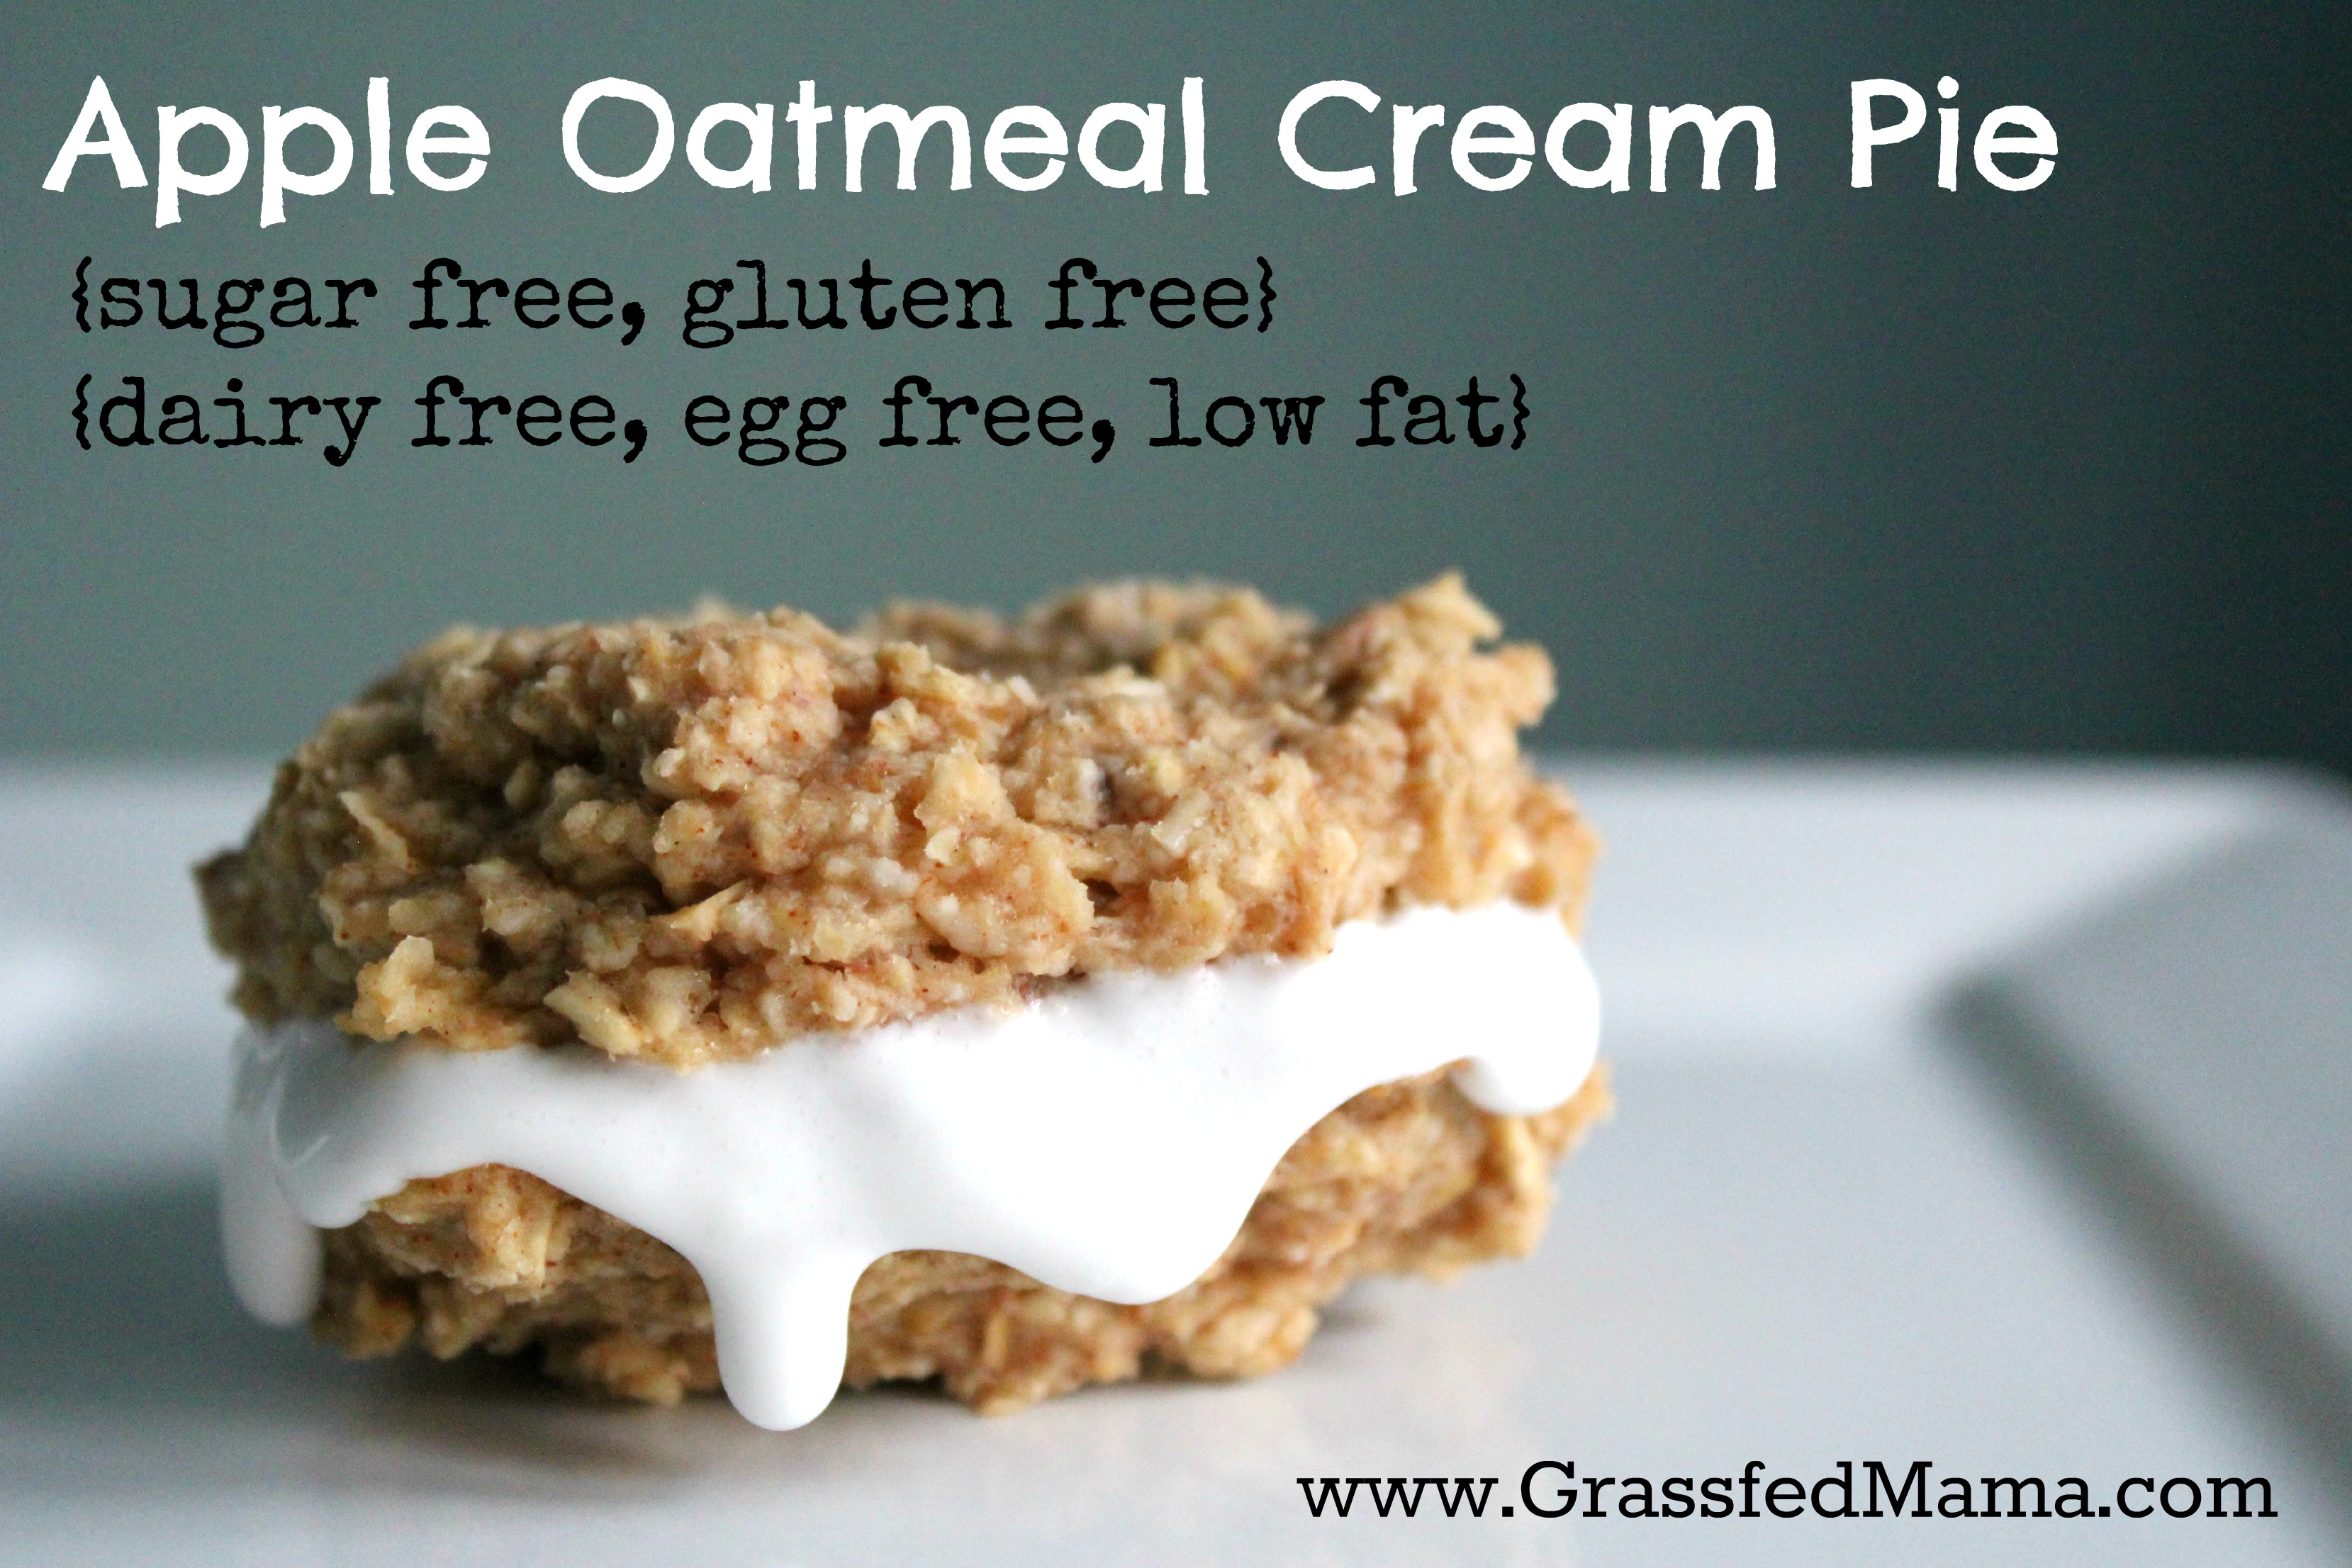 Sugar free, gluten free, low fat, egg free